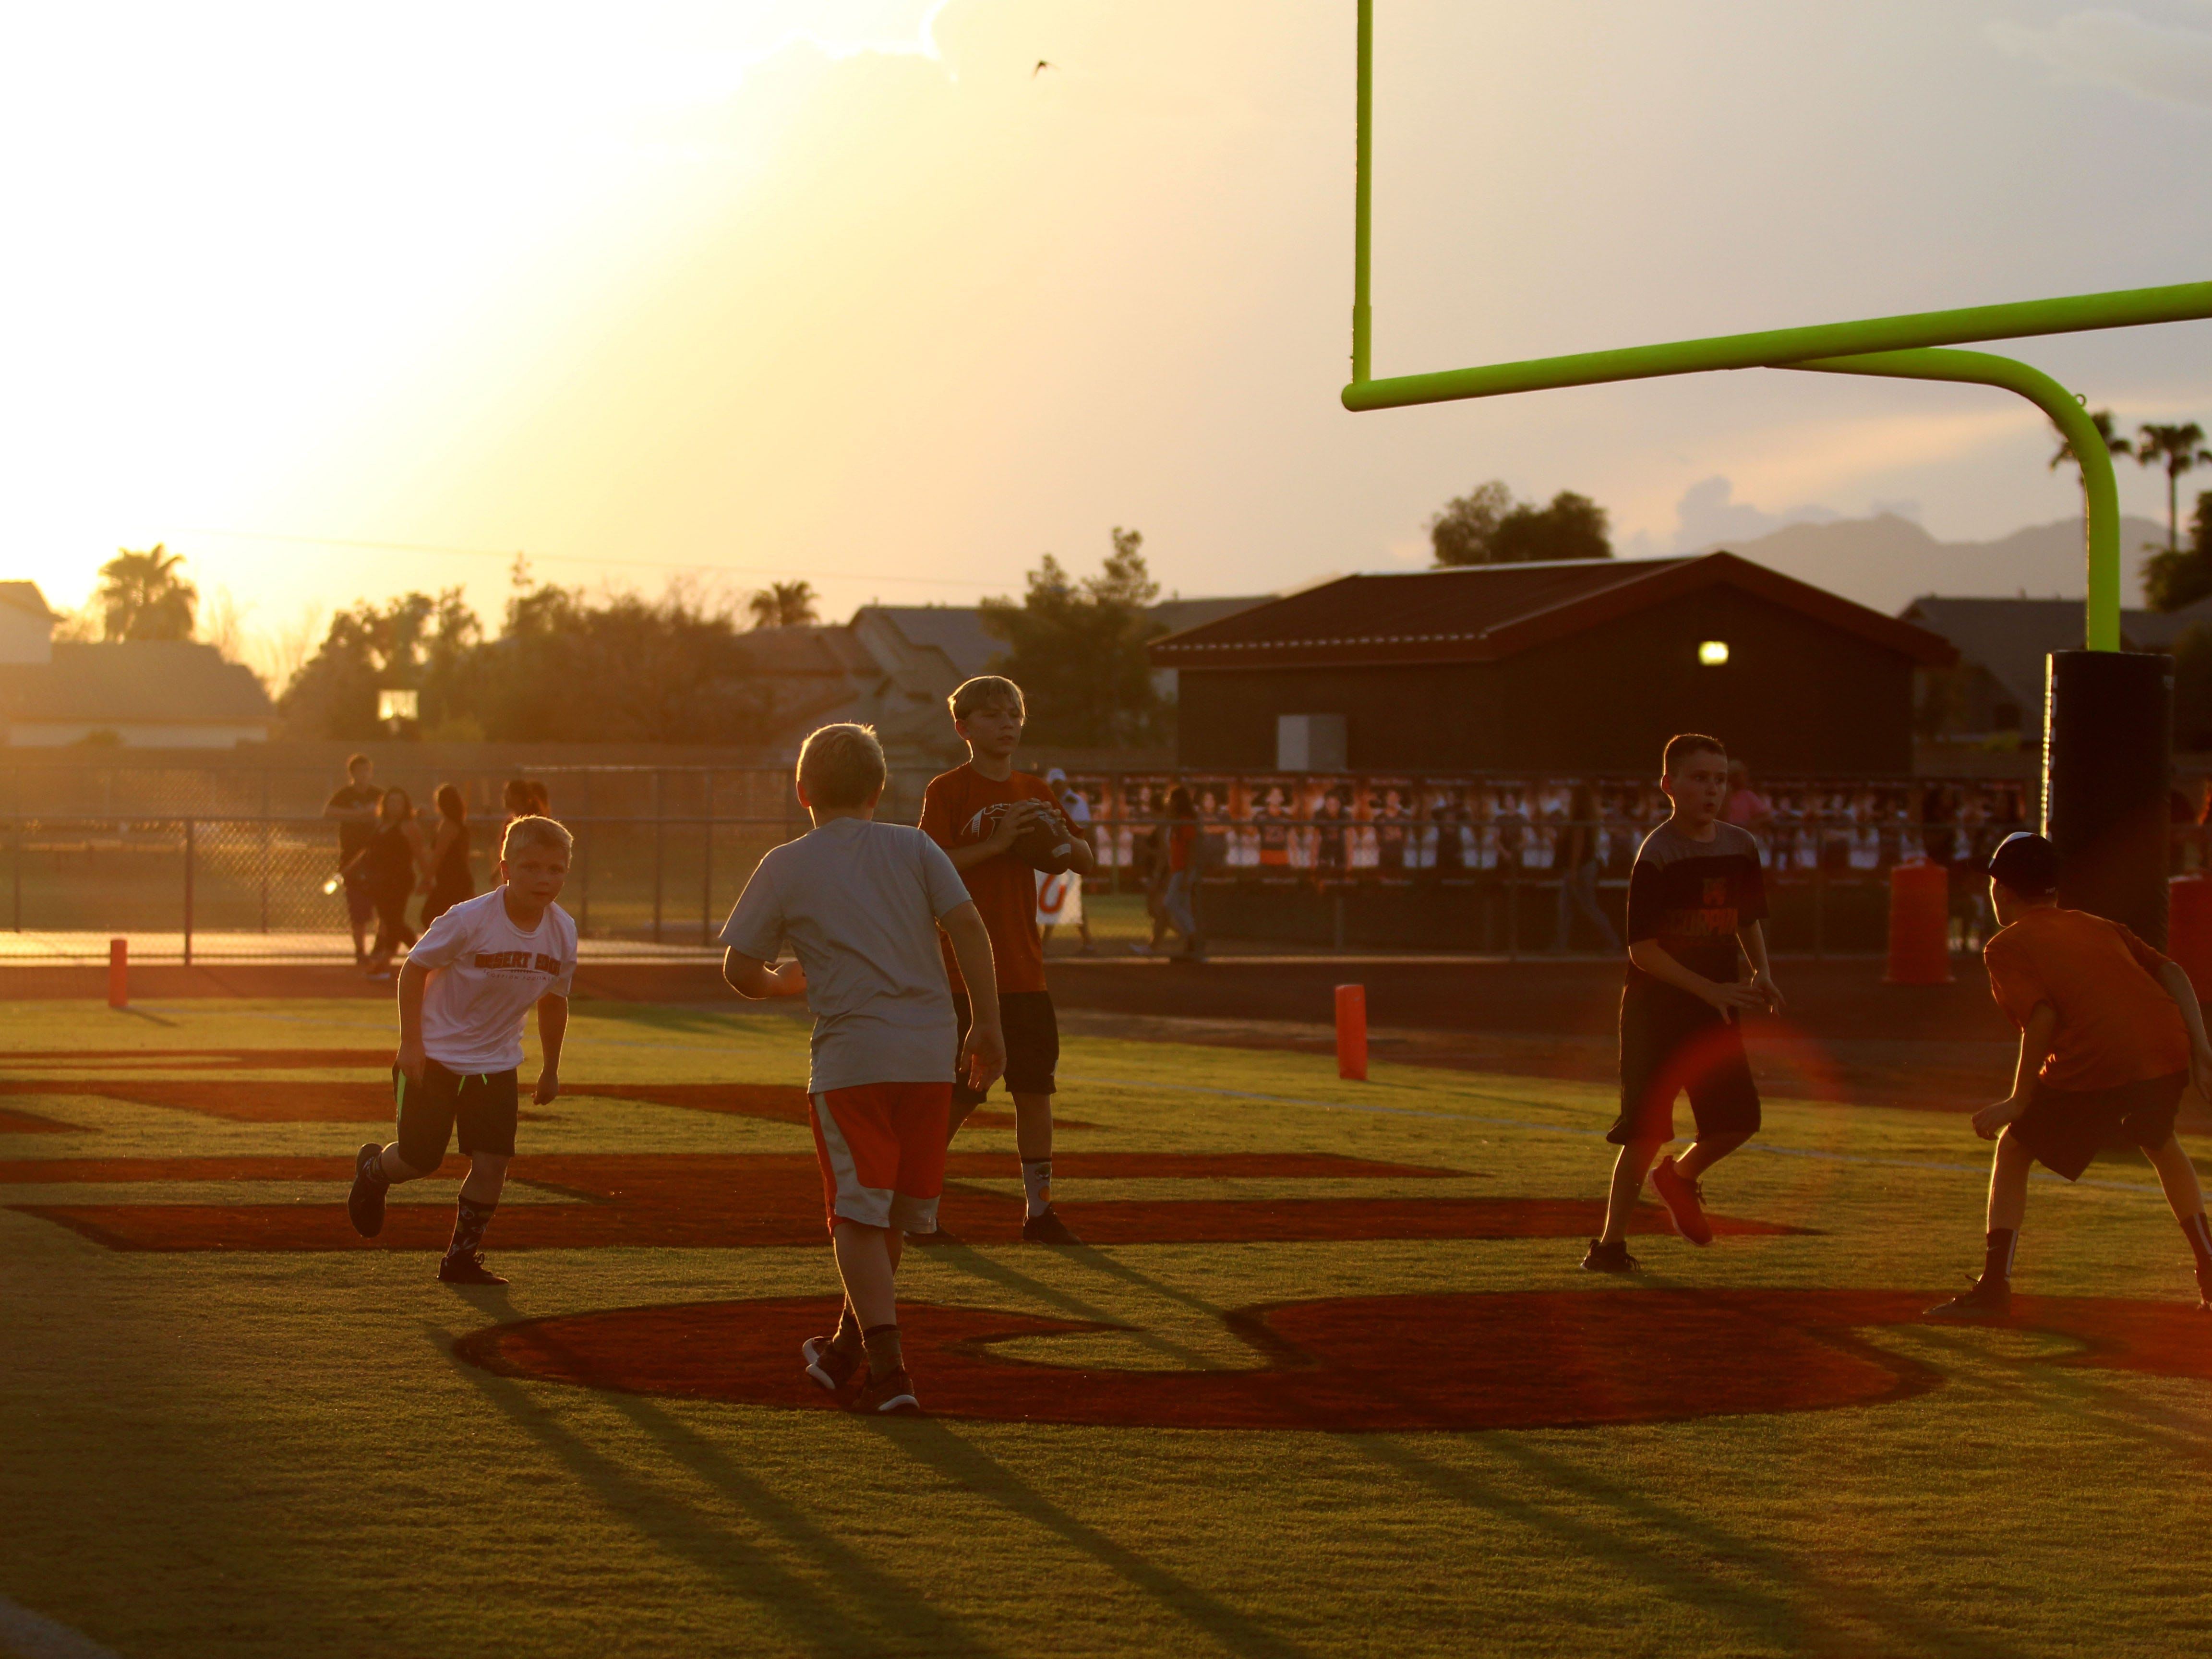 Kids play football on the field before Desert Edge plays Moon Valley, Goodyear, Ariz. August 24, 2018.